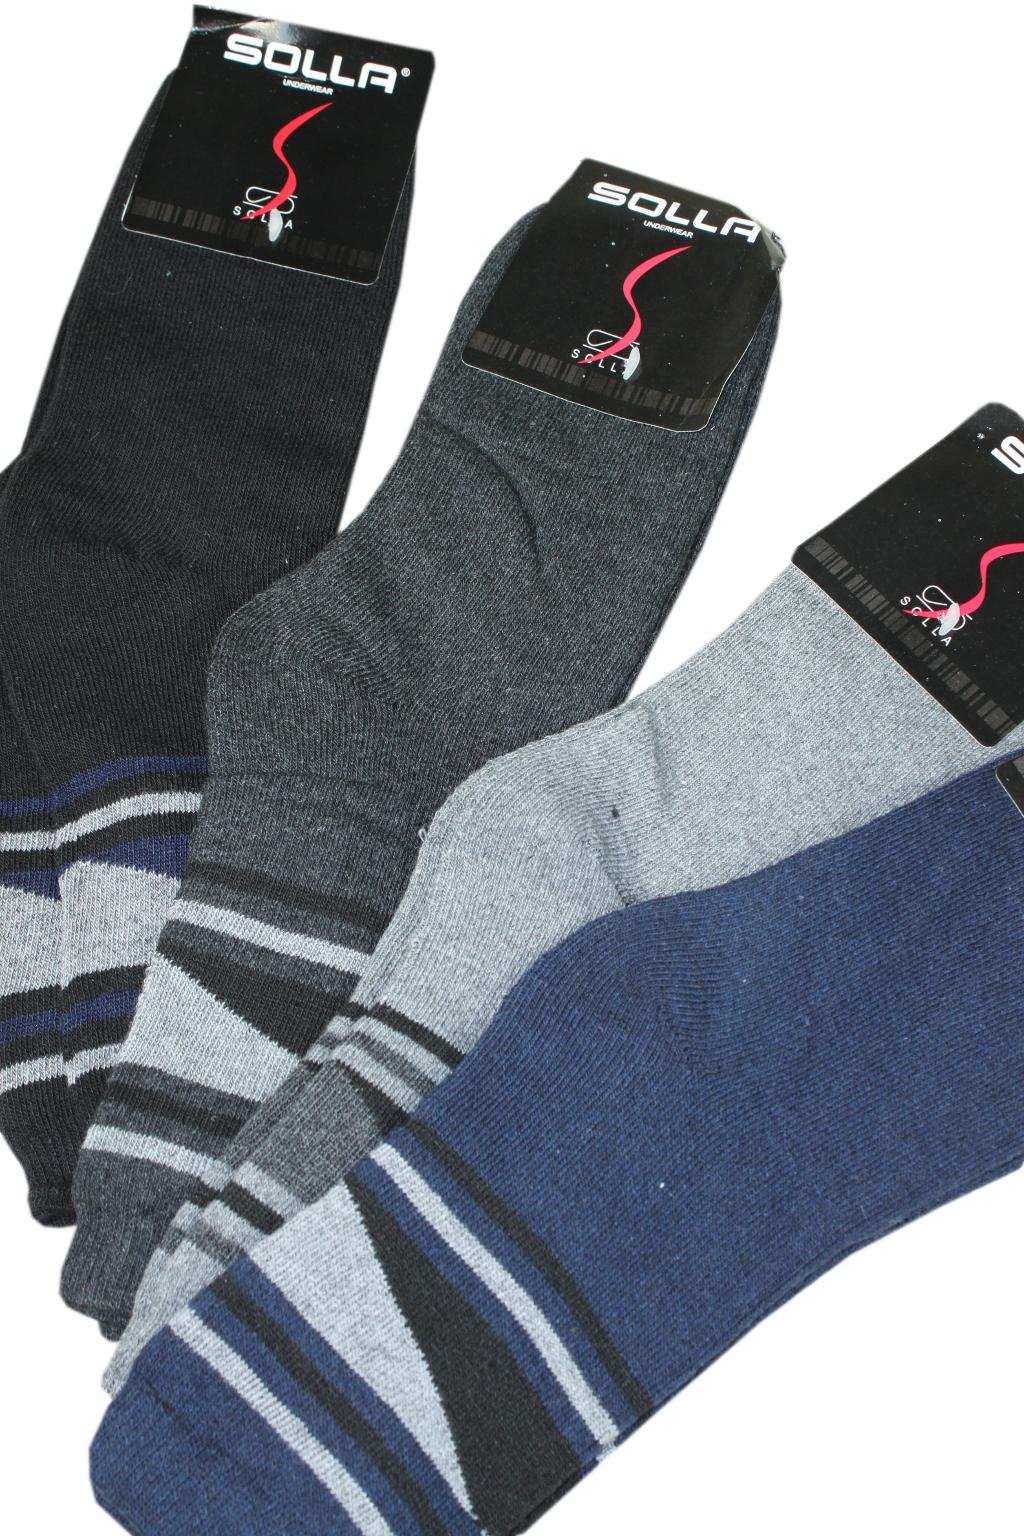 Joto Solla teplé ponožky - 3bal 43-47 MIX